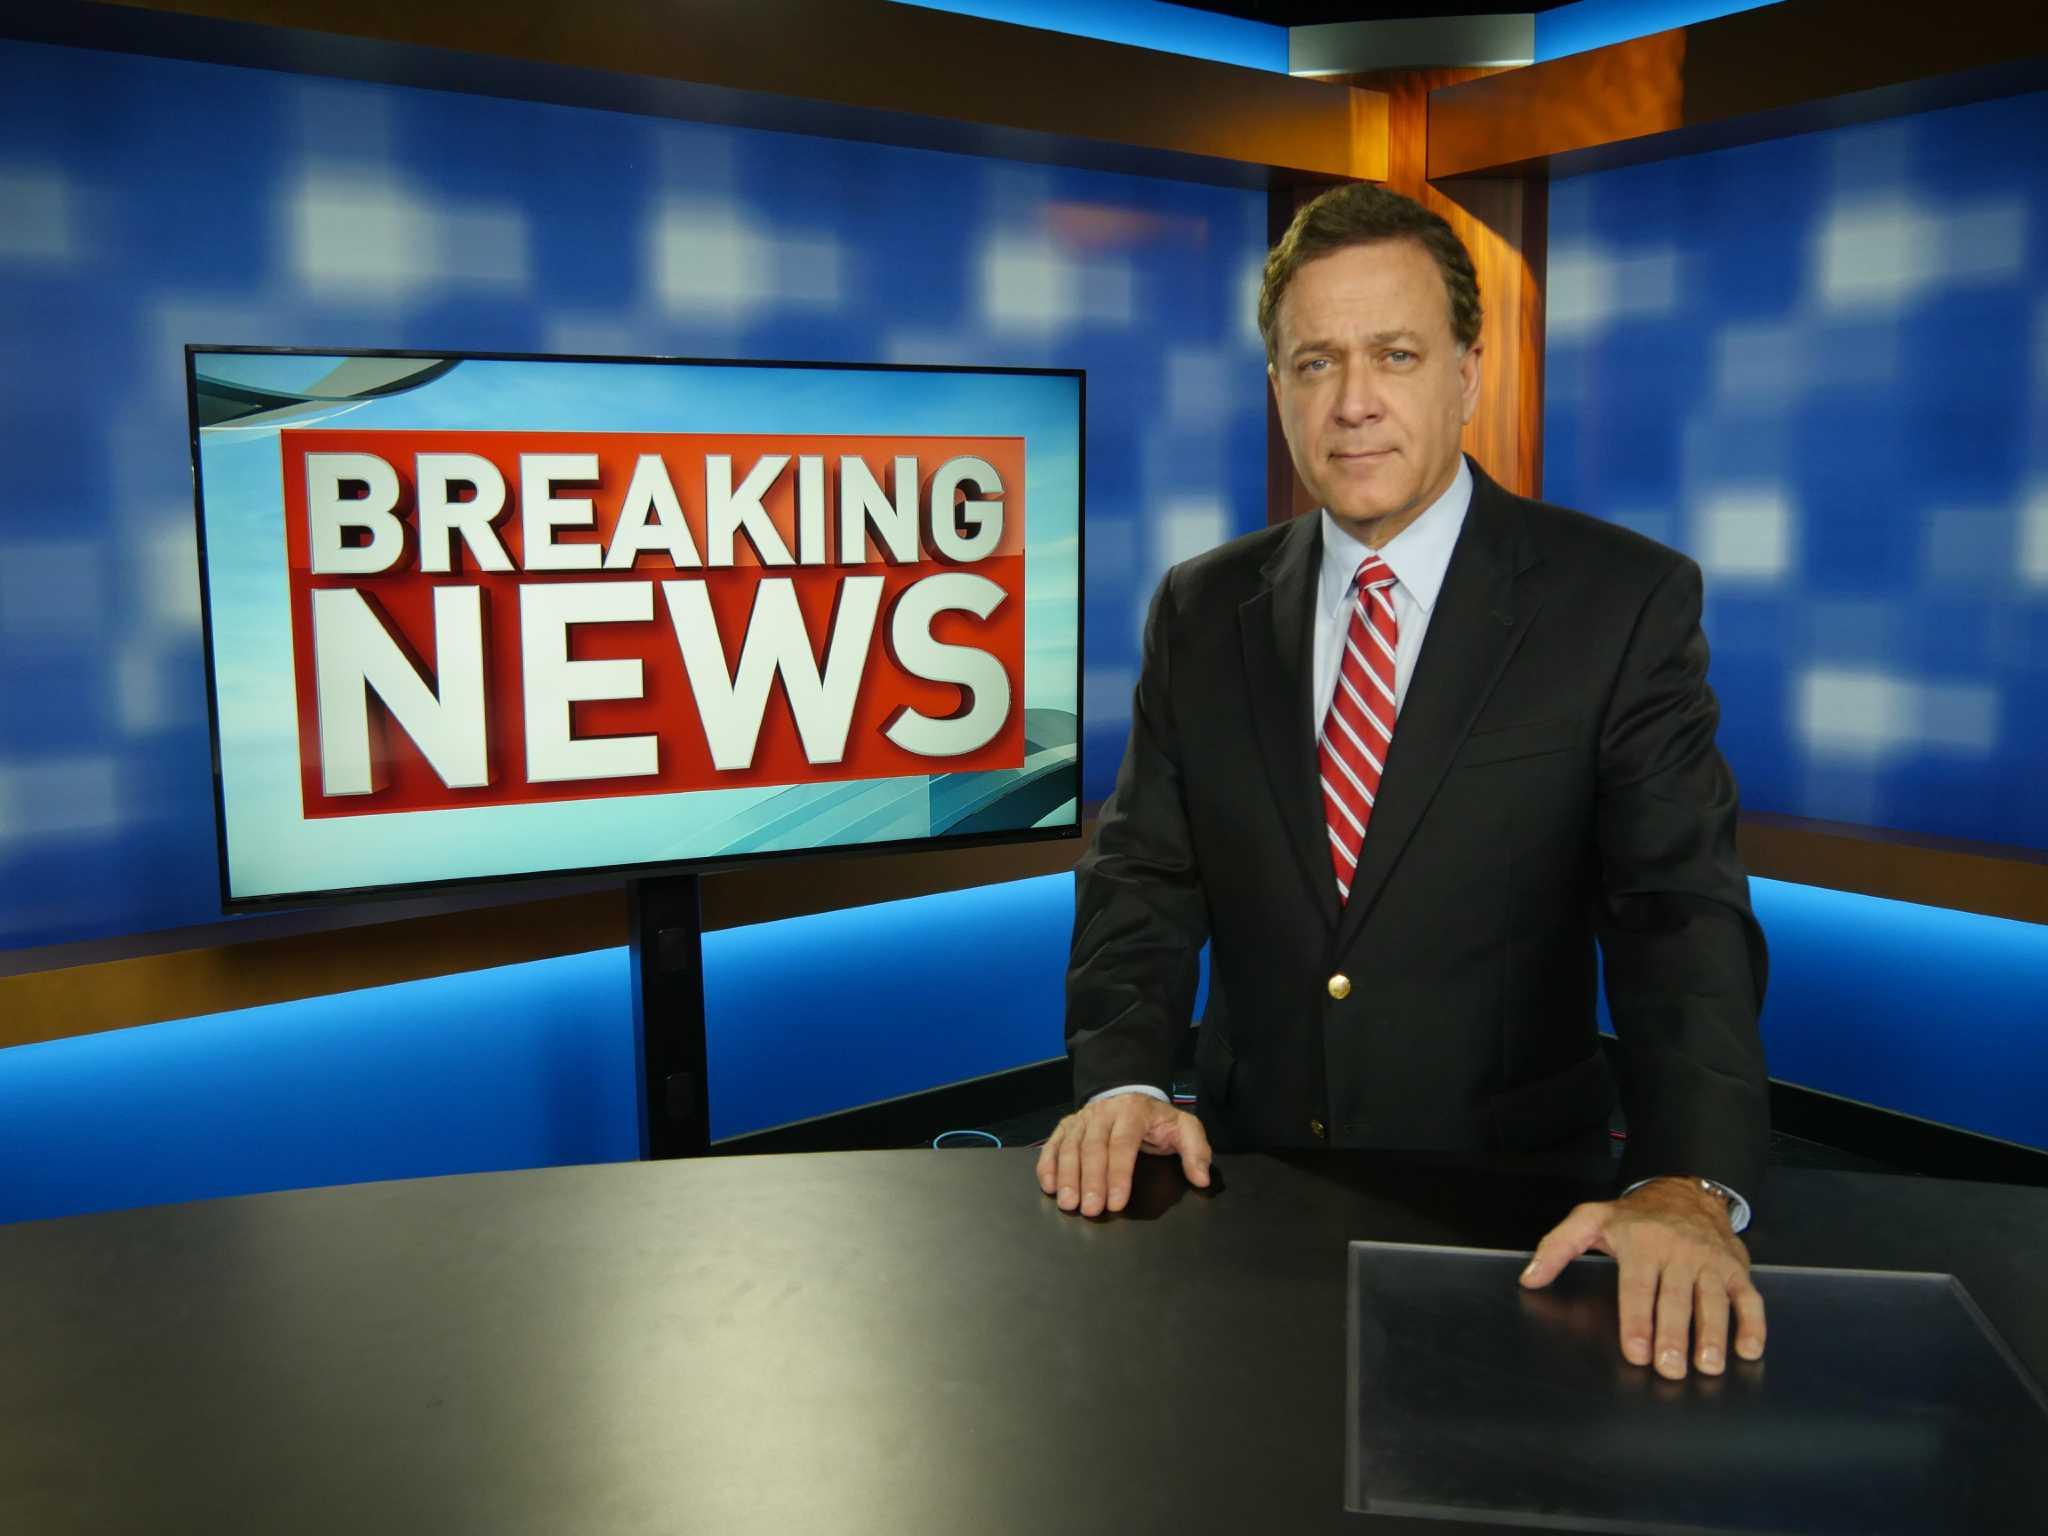 brads deals breaking news - HD2048×1536